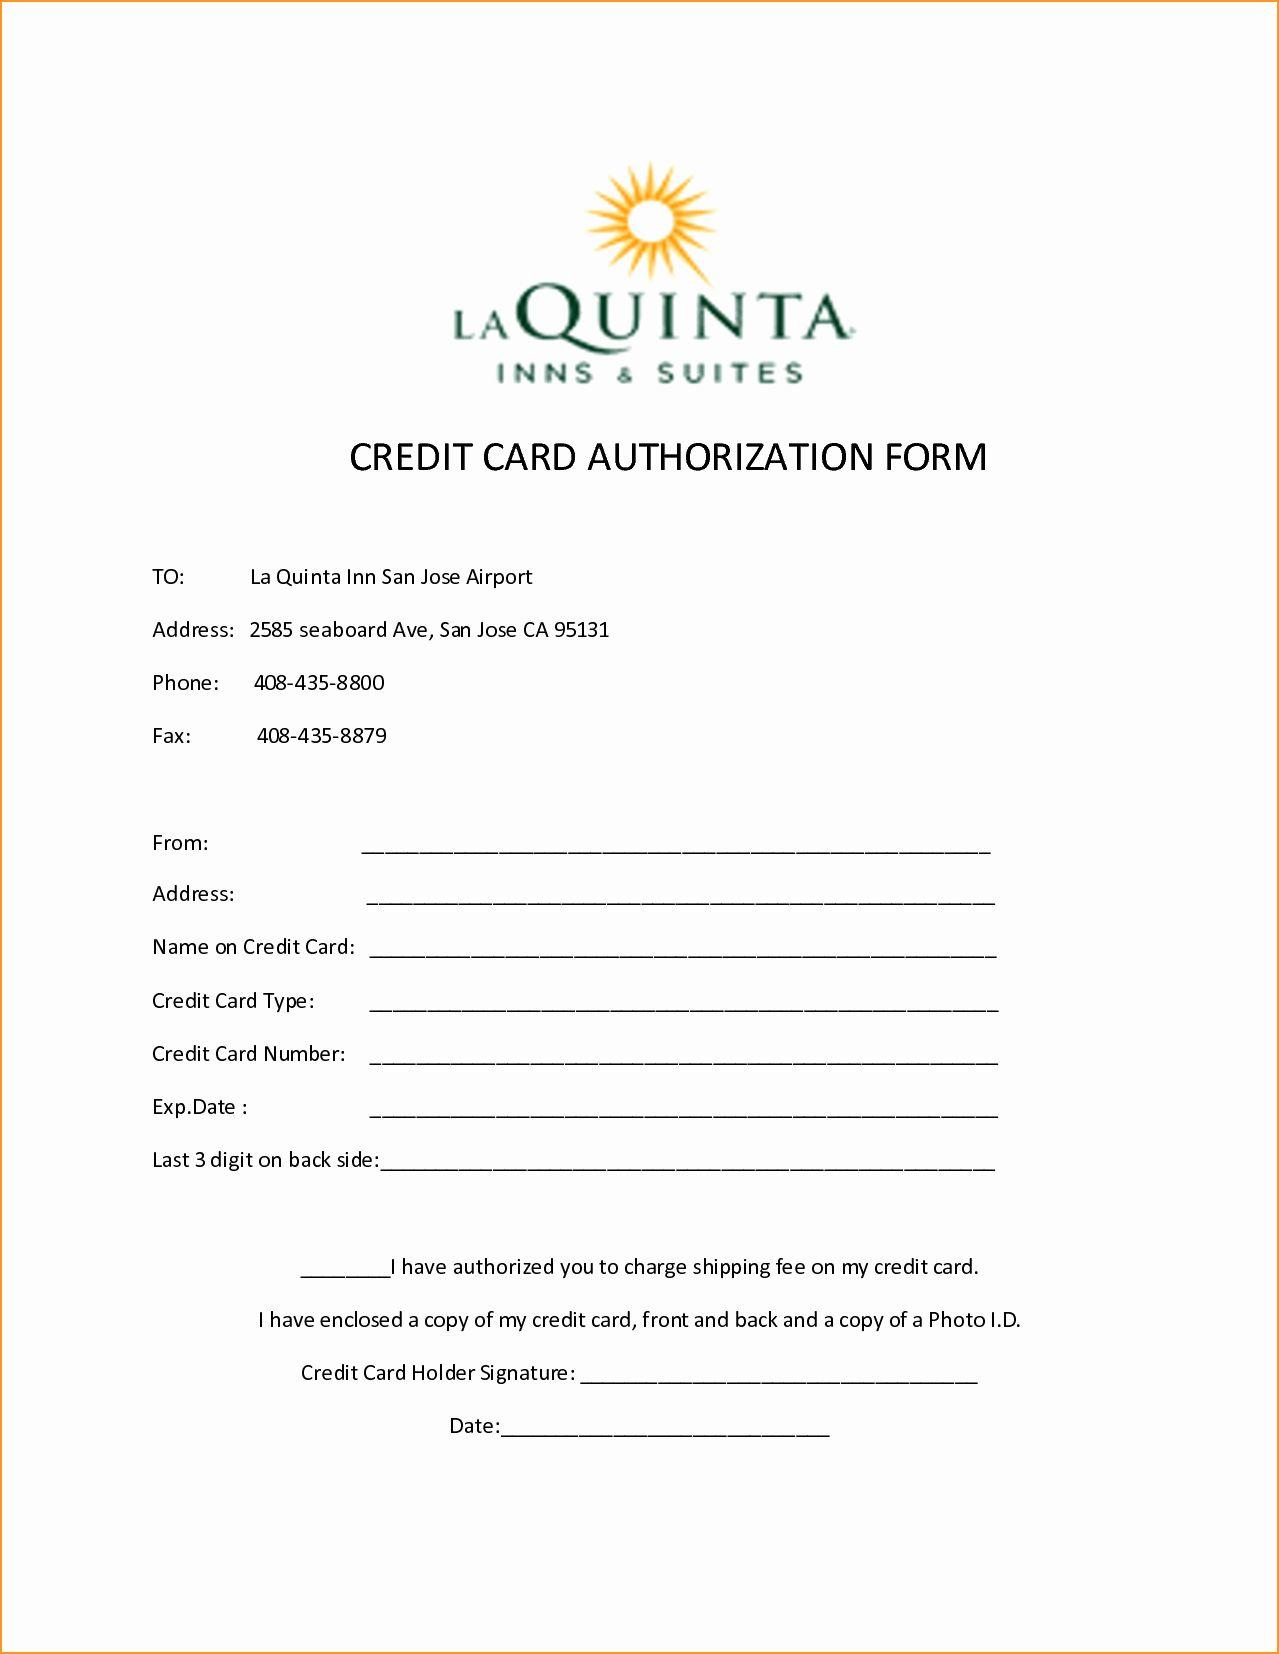 Credit card authorization form template elegant 10 credit